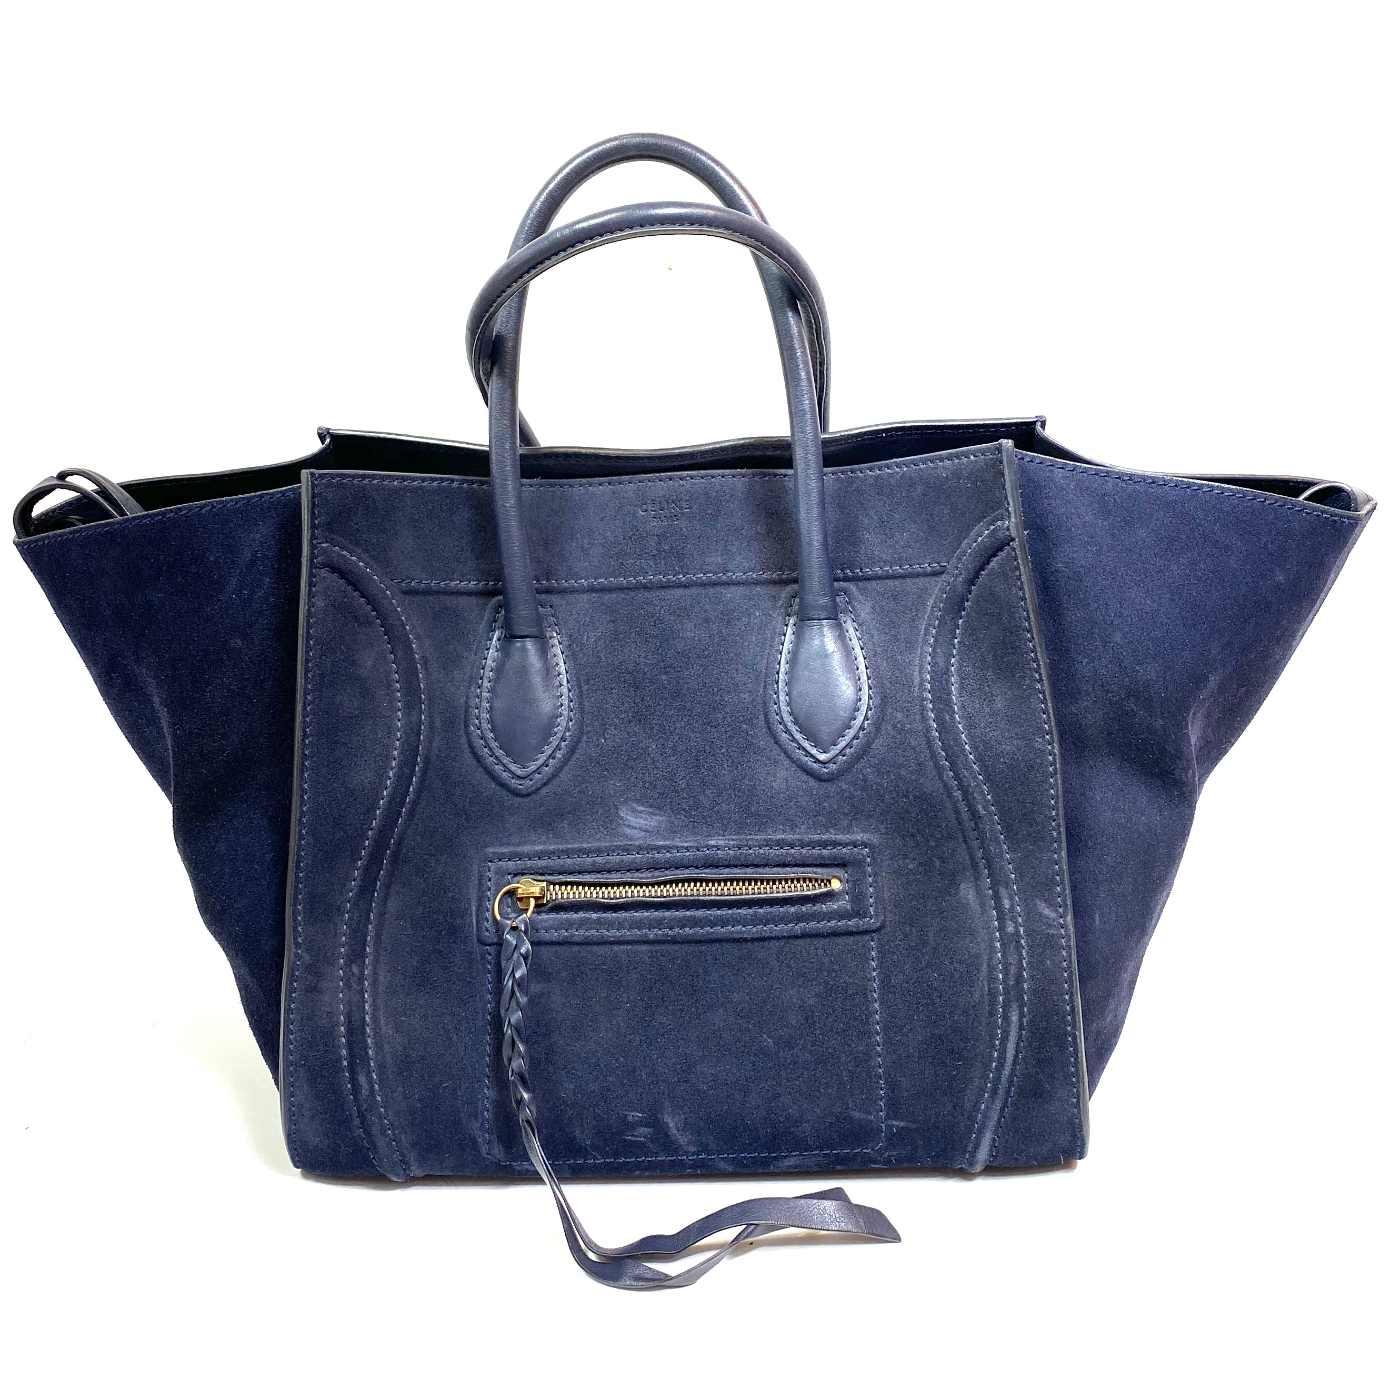 Bolsa Celine Phantom Azul